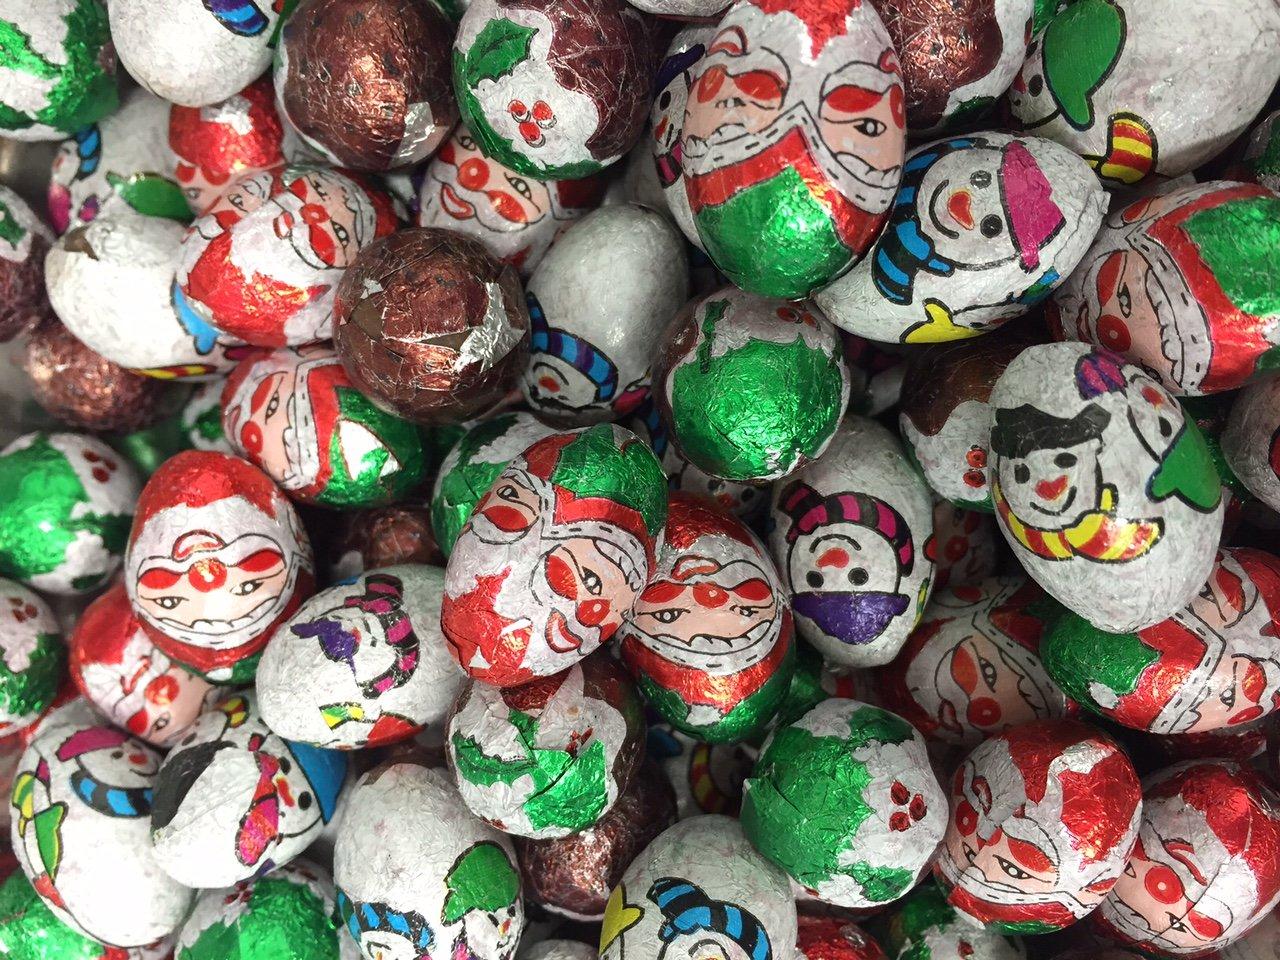 Christmas Festive Chocolate Foils 500g Bag…: Amazon.co.uk: Grocery